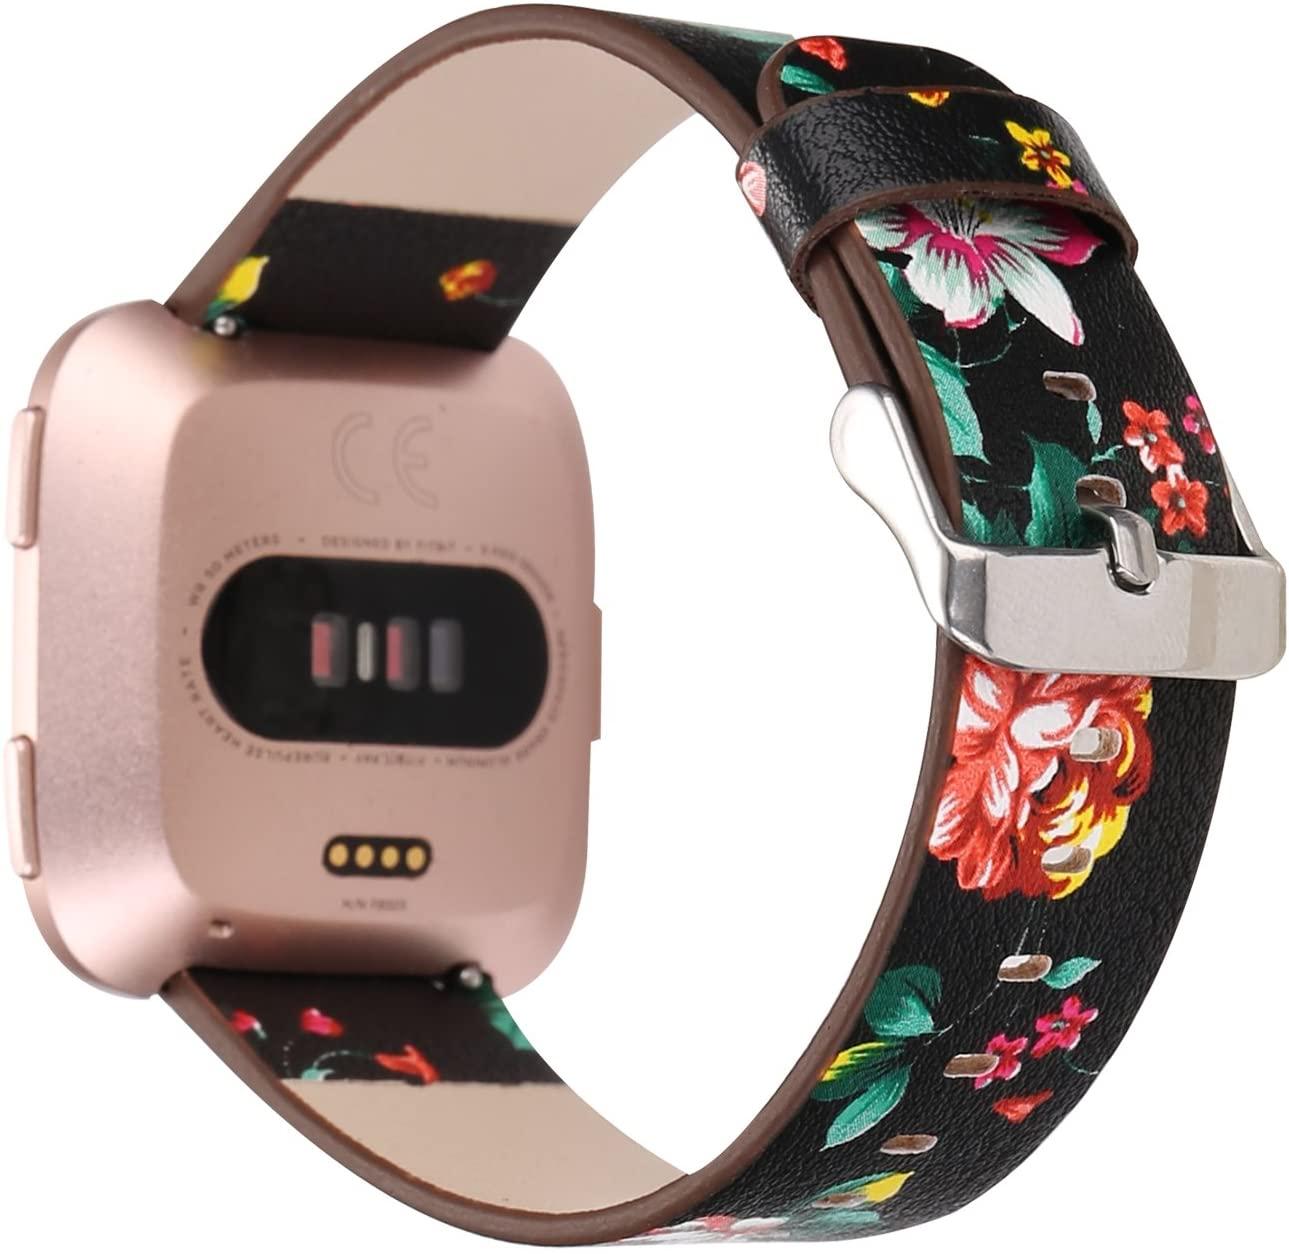 Bands for Fitbit Versa & Versa Lite/Versa 2, Jimbird PU Leather Replacement Bracelet Wrist Watch Band for Fitbit Versa Fitness Smart Watch